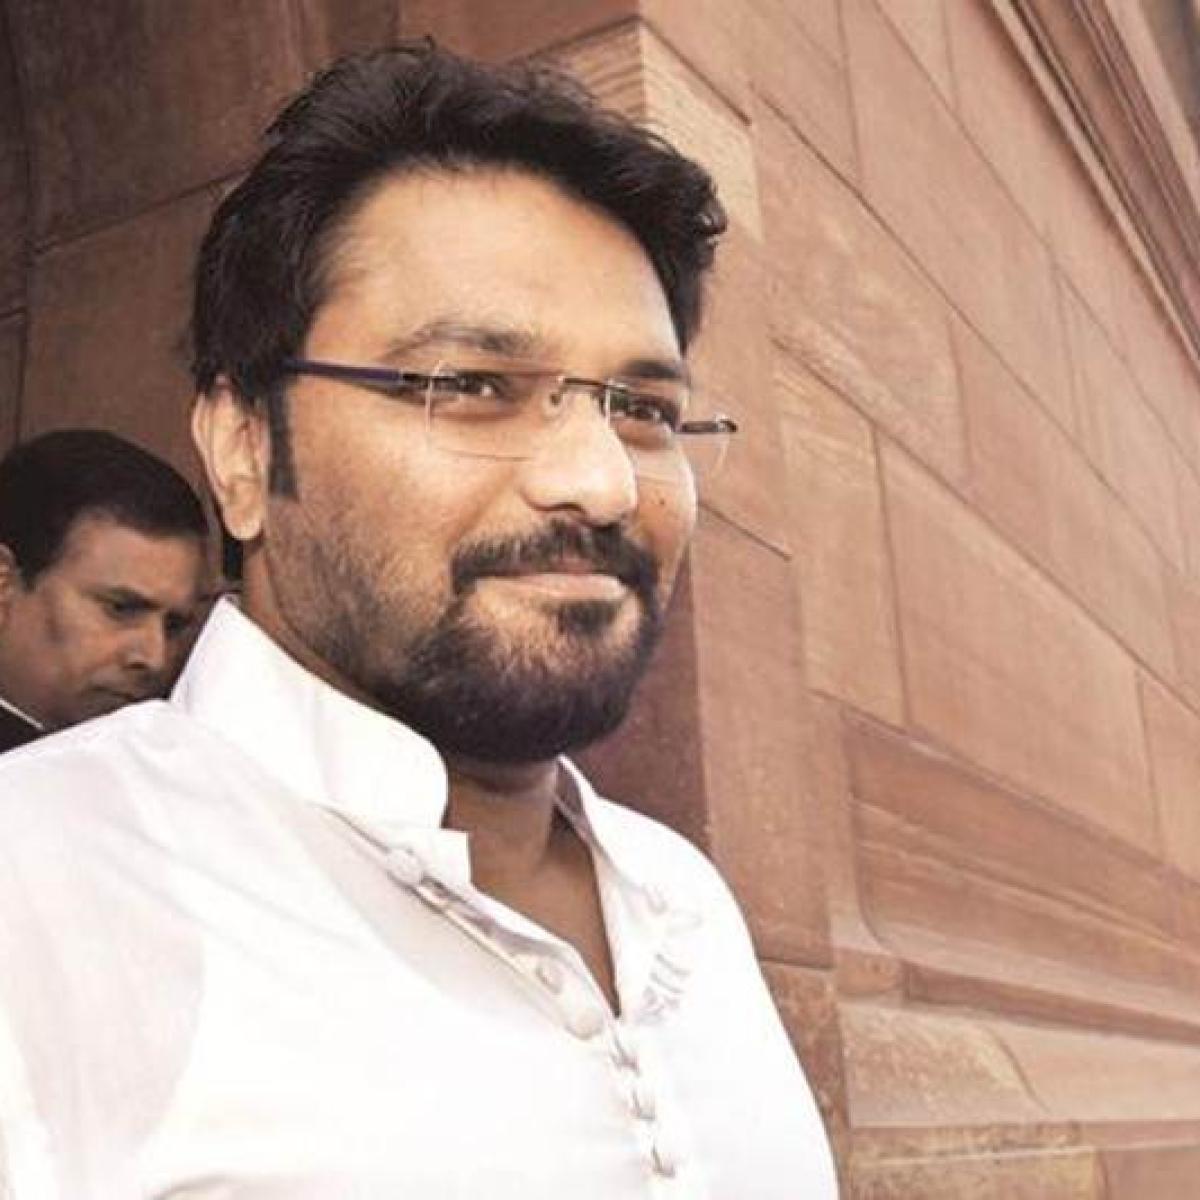 BJP MP Babul Supriyo calls Dilip Ghosh's comments irresponsible